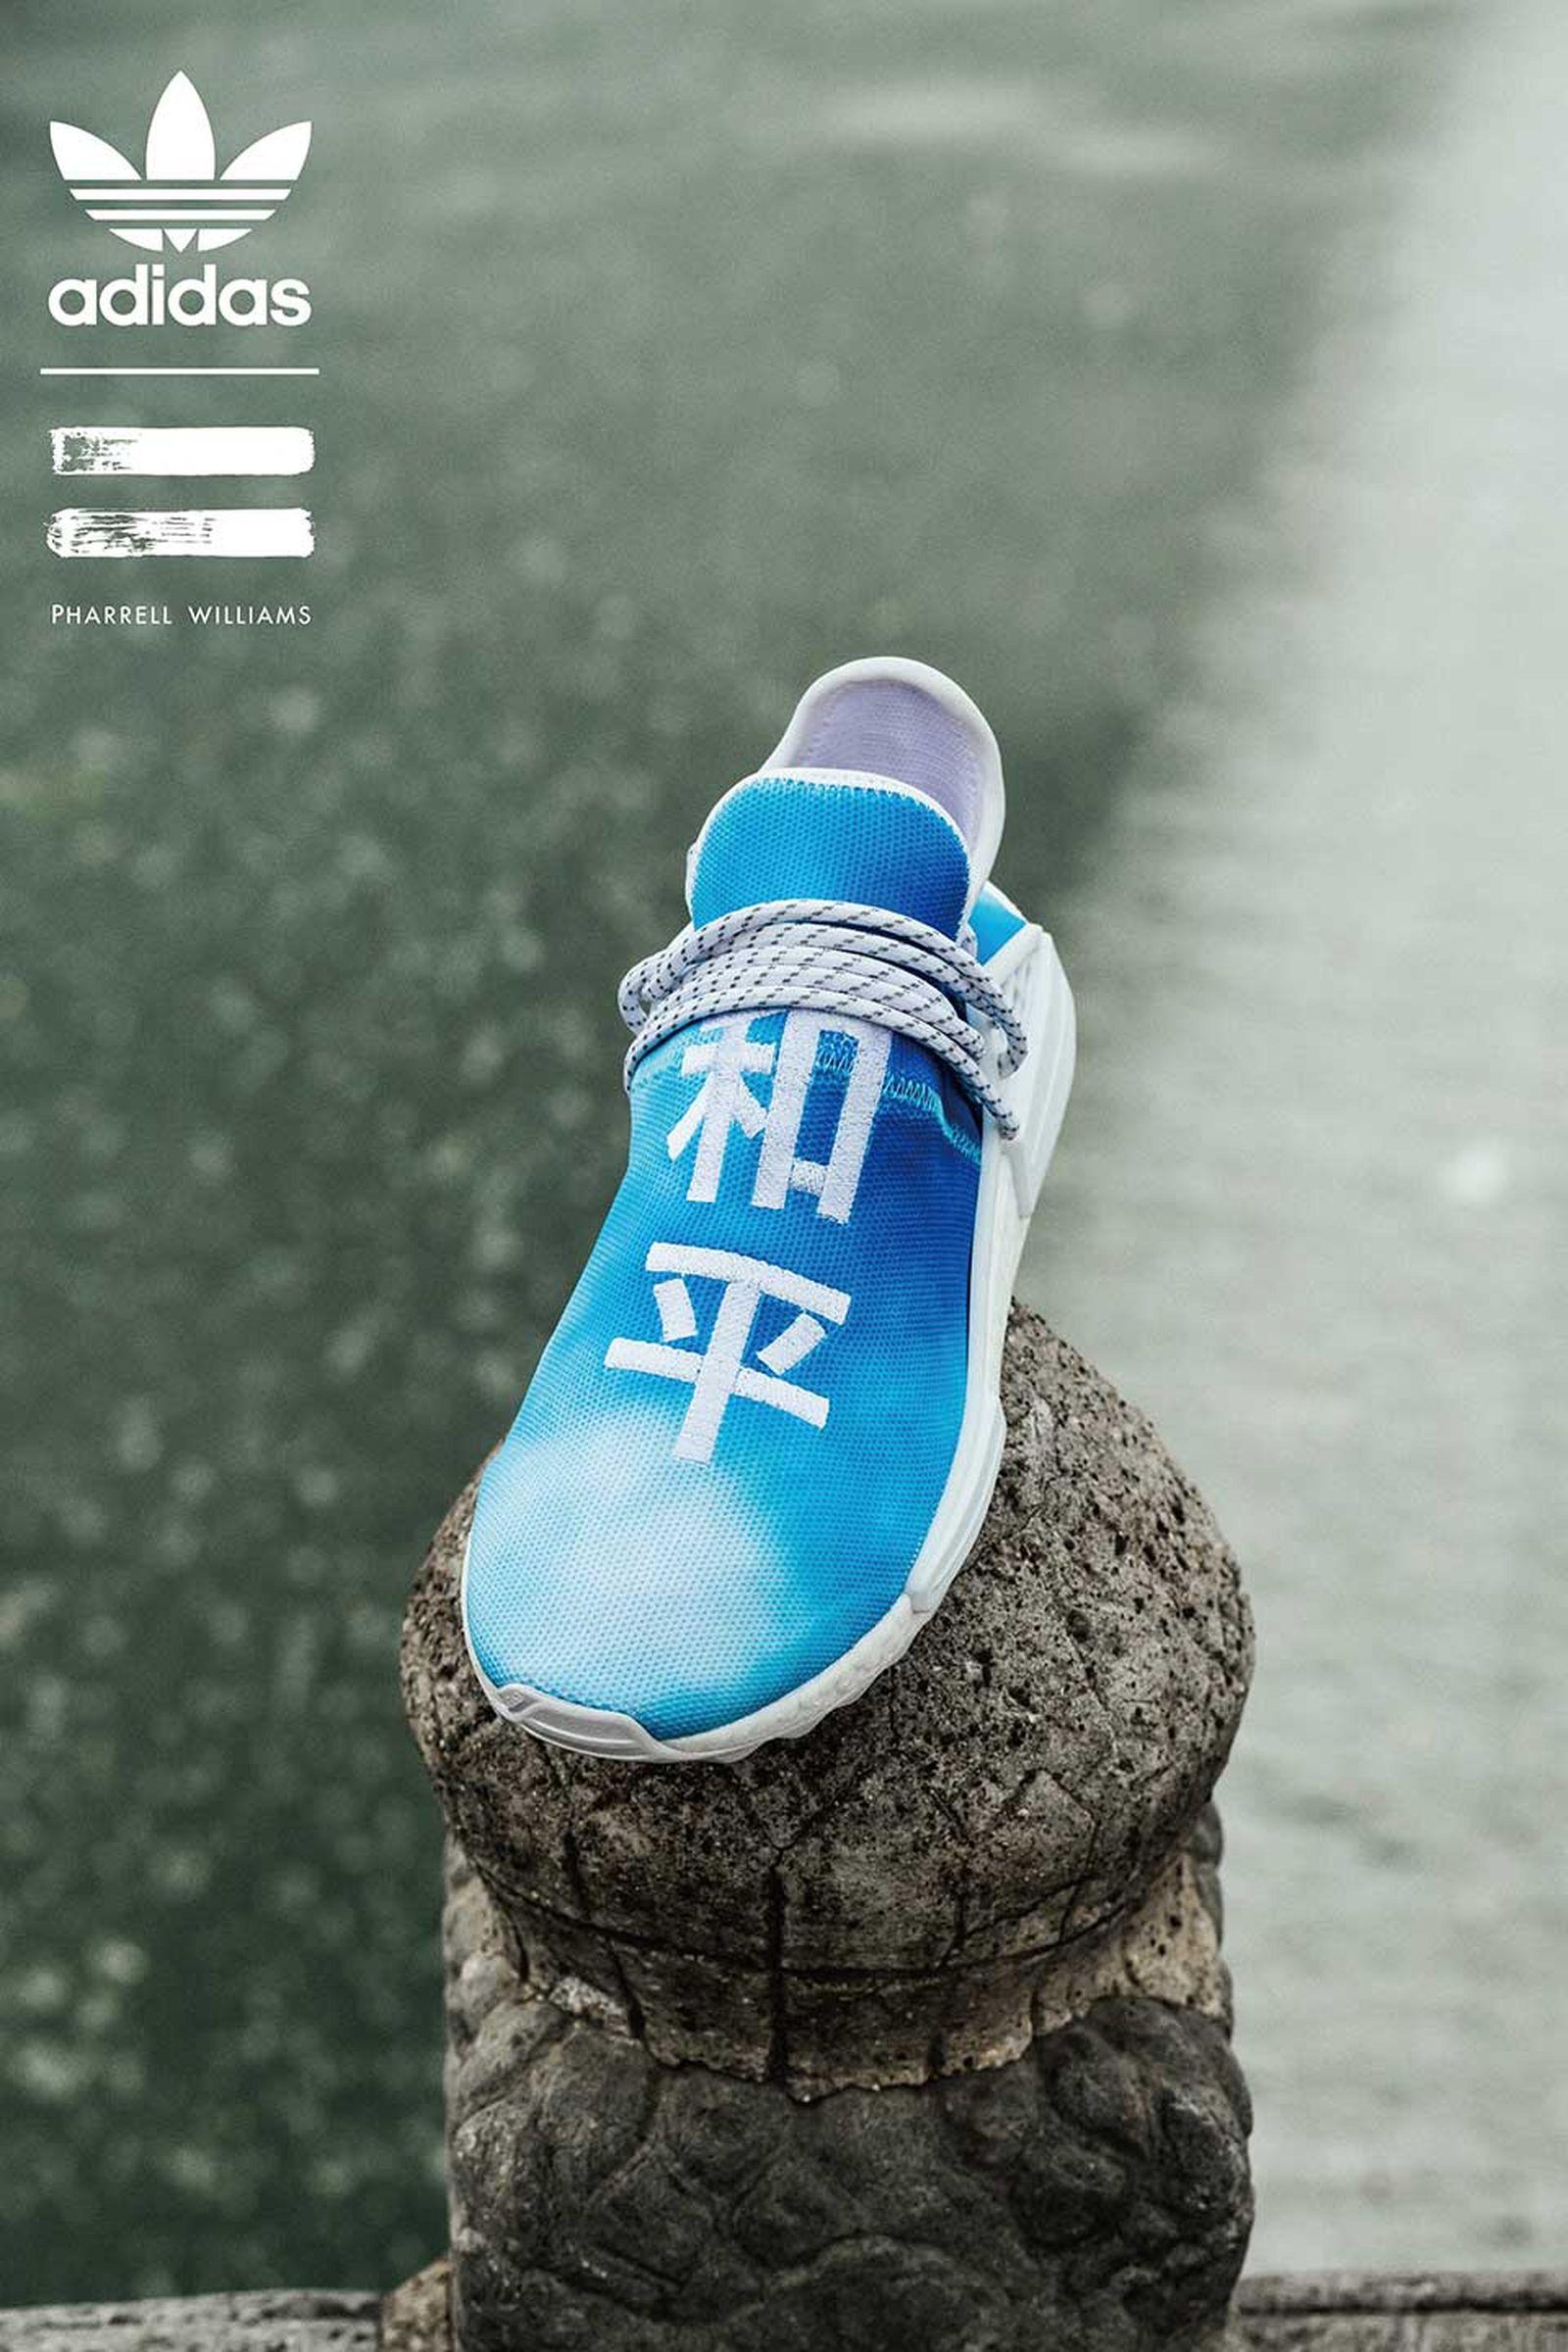 adidas-pharrell-williams-hu-nmd-china-release-price-04